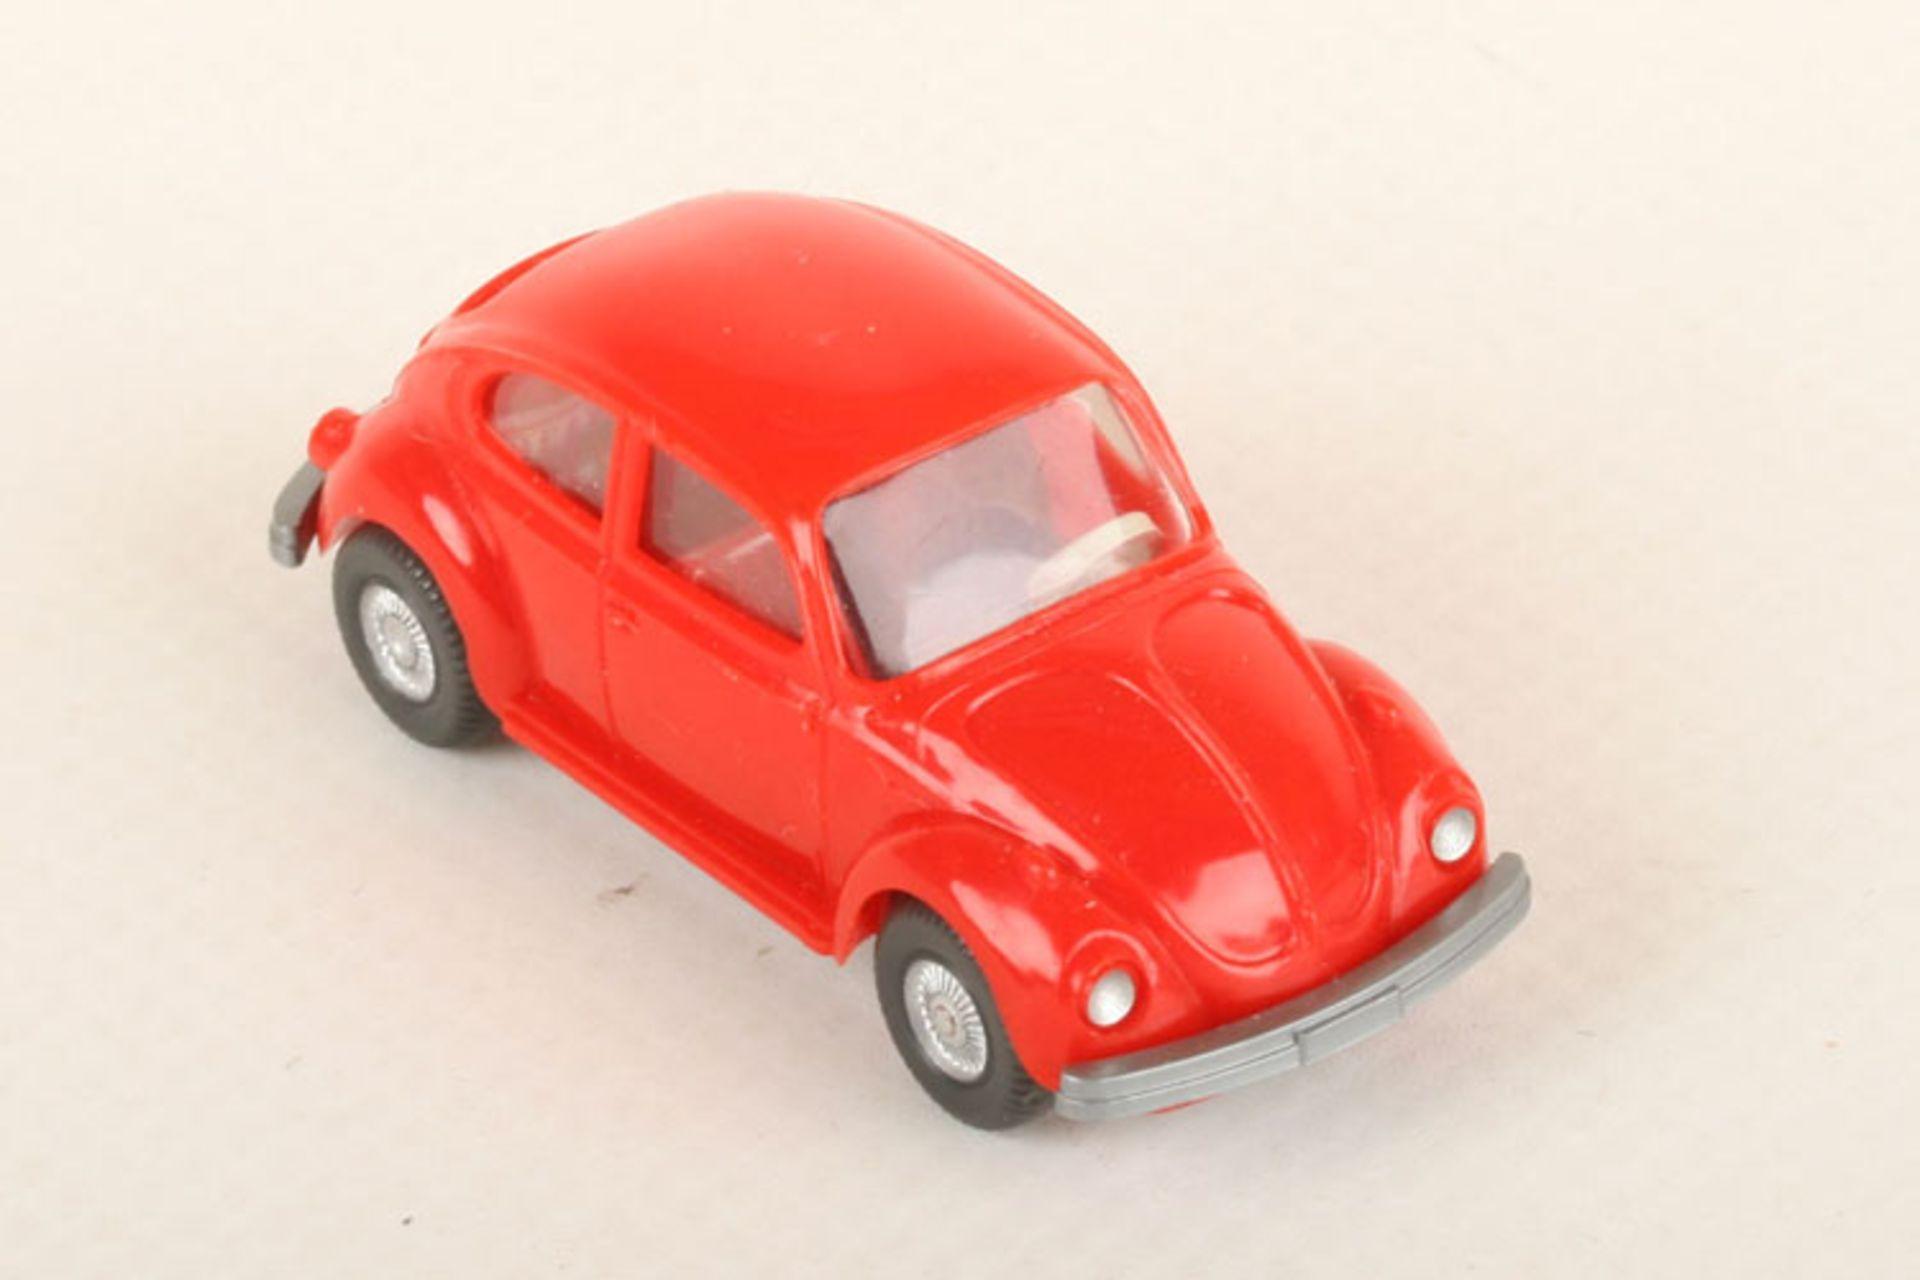 Los 1009 - Wiking VW Käfer 1303 orangerot 30/13f, neuwertig